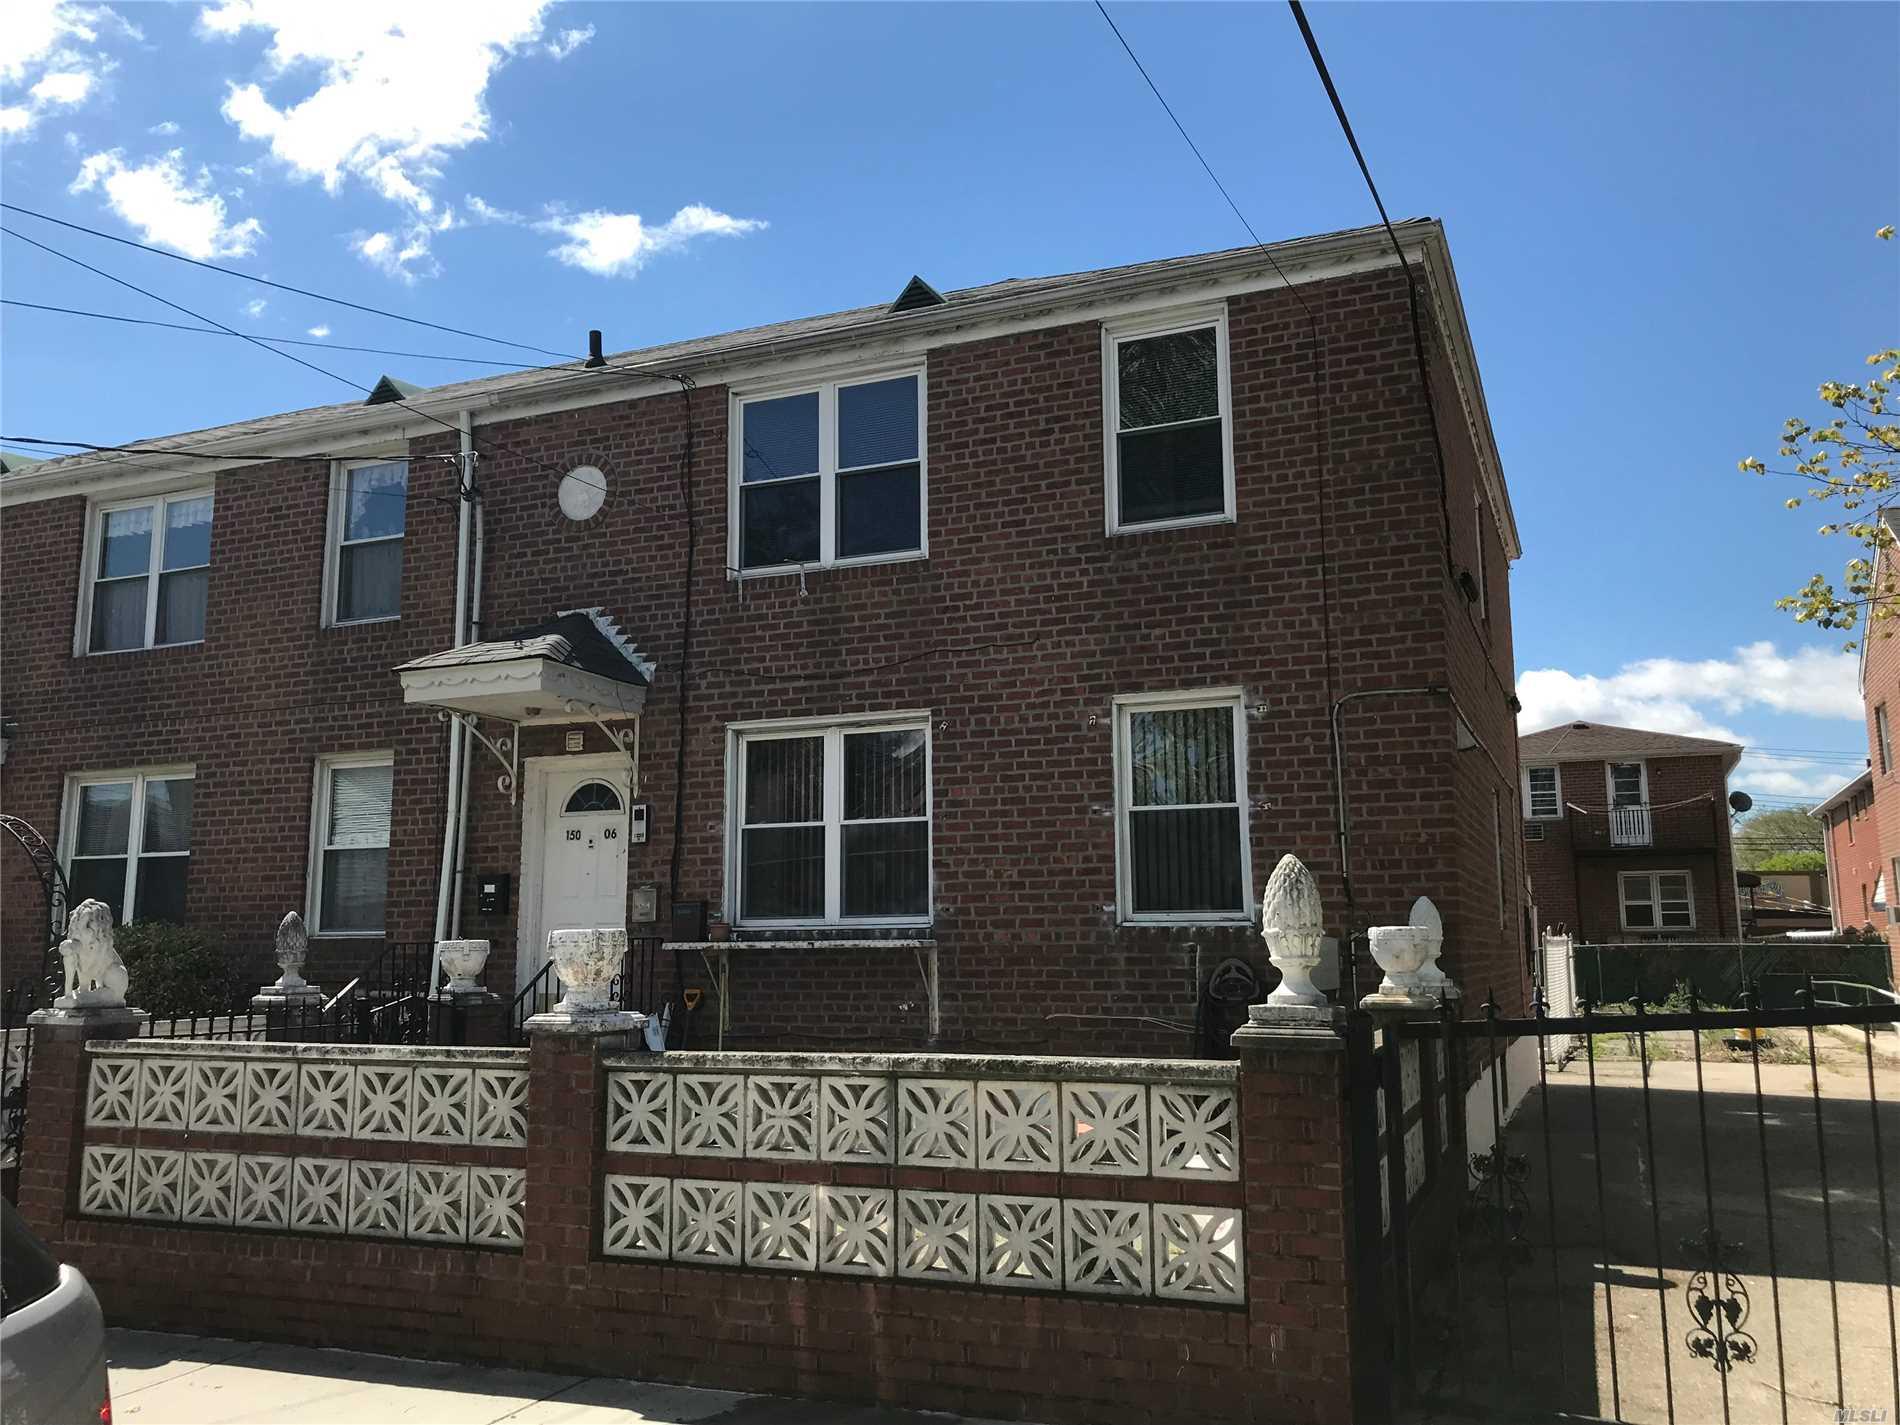 Property for sale at 150-06 23 Avenue, Whitestone NY 11357, Whitestone,  New York 11357